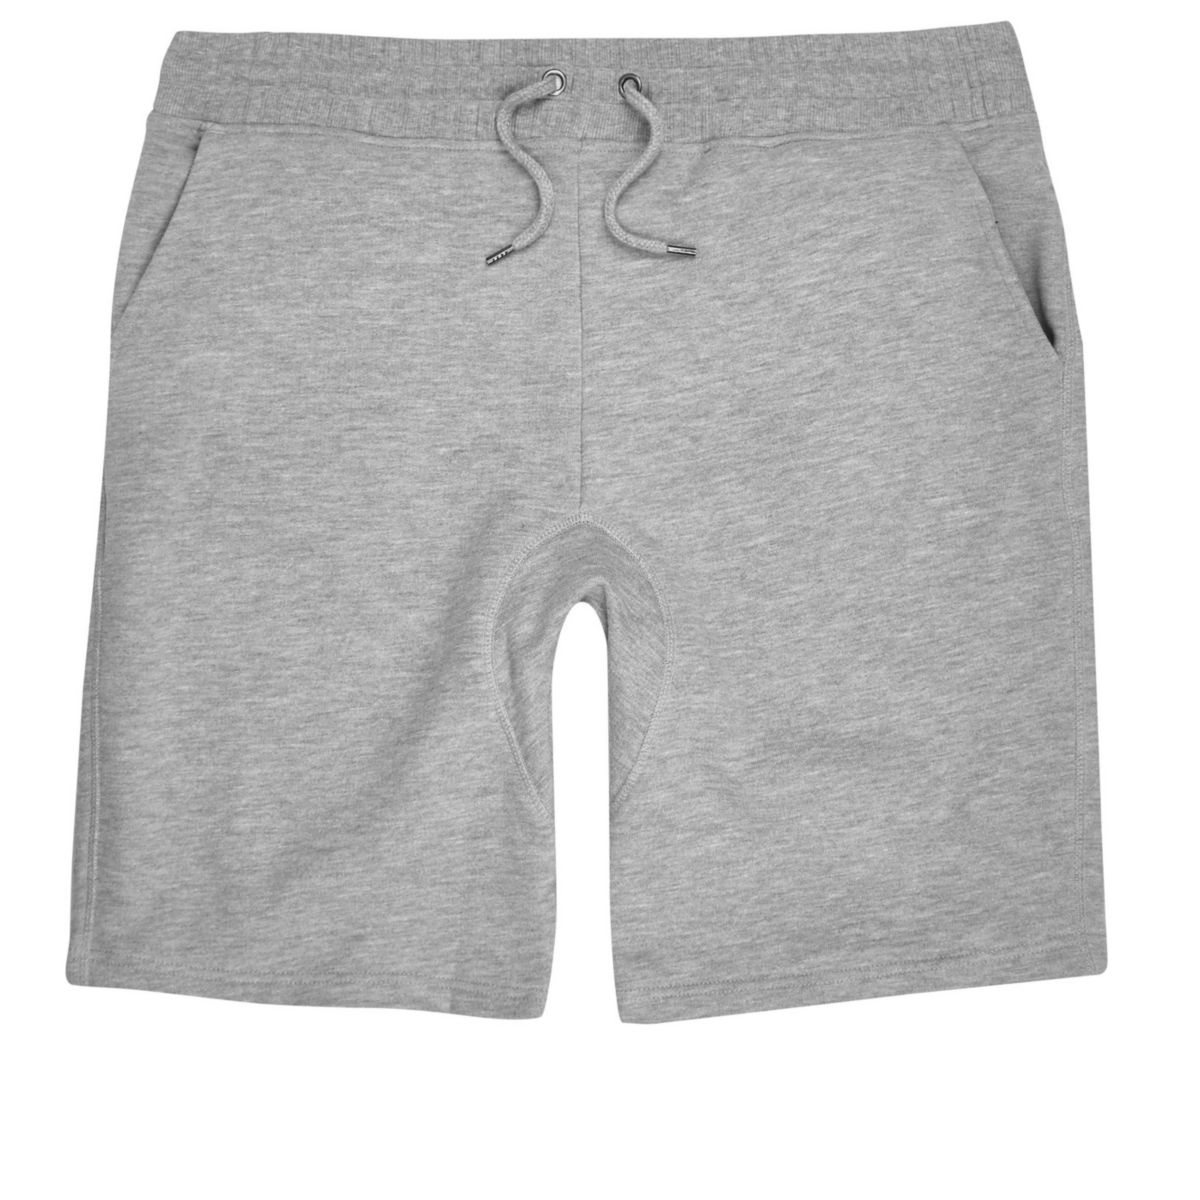 Big & Tall – Graue Jersey-Shorts